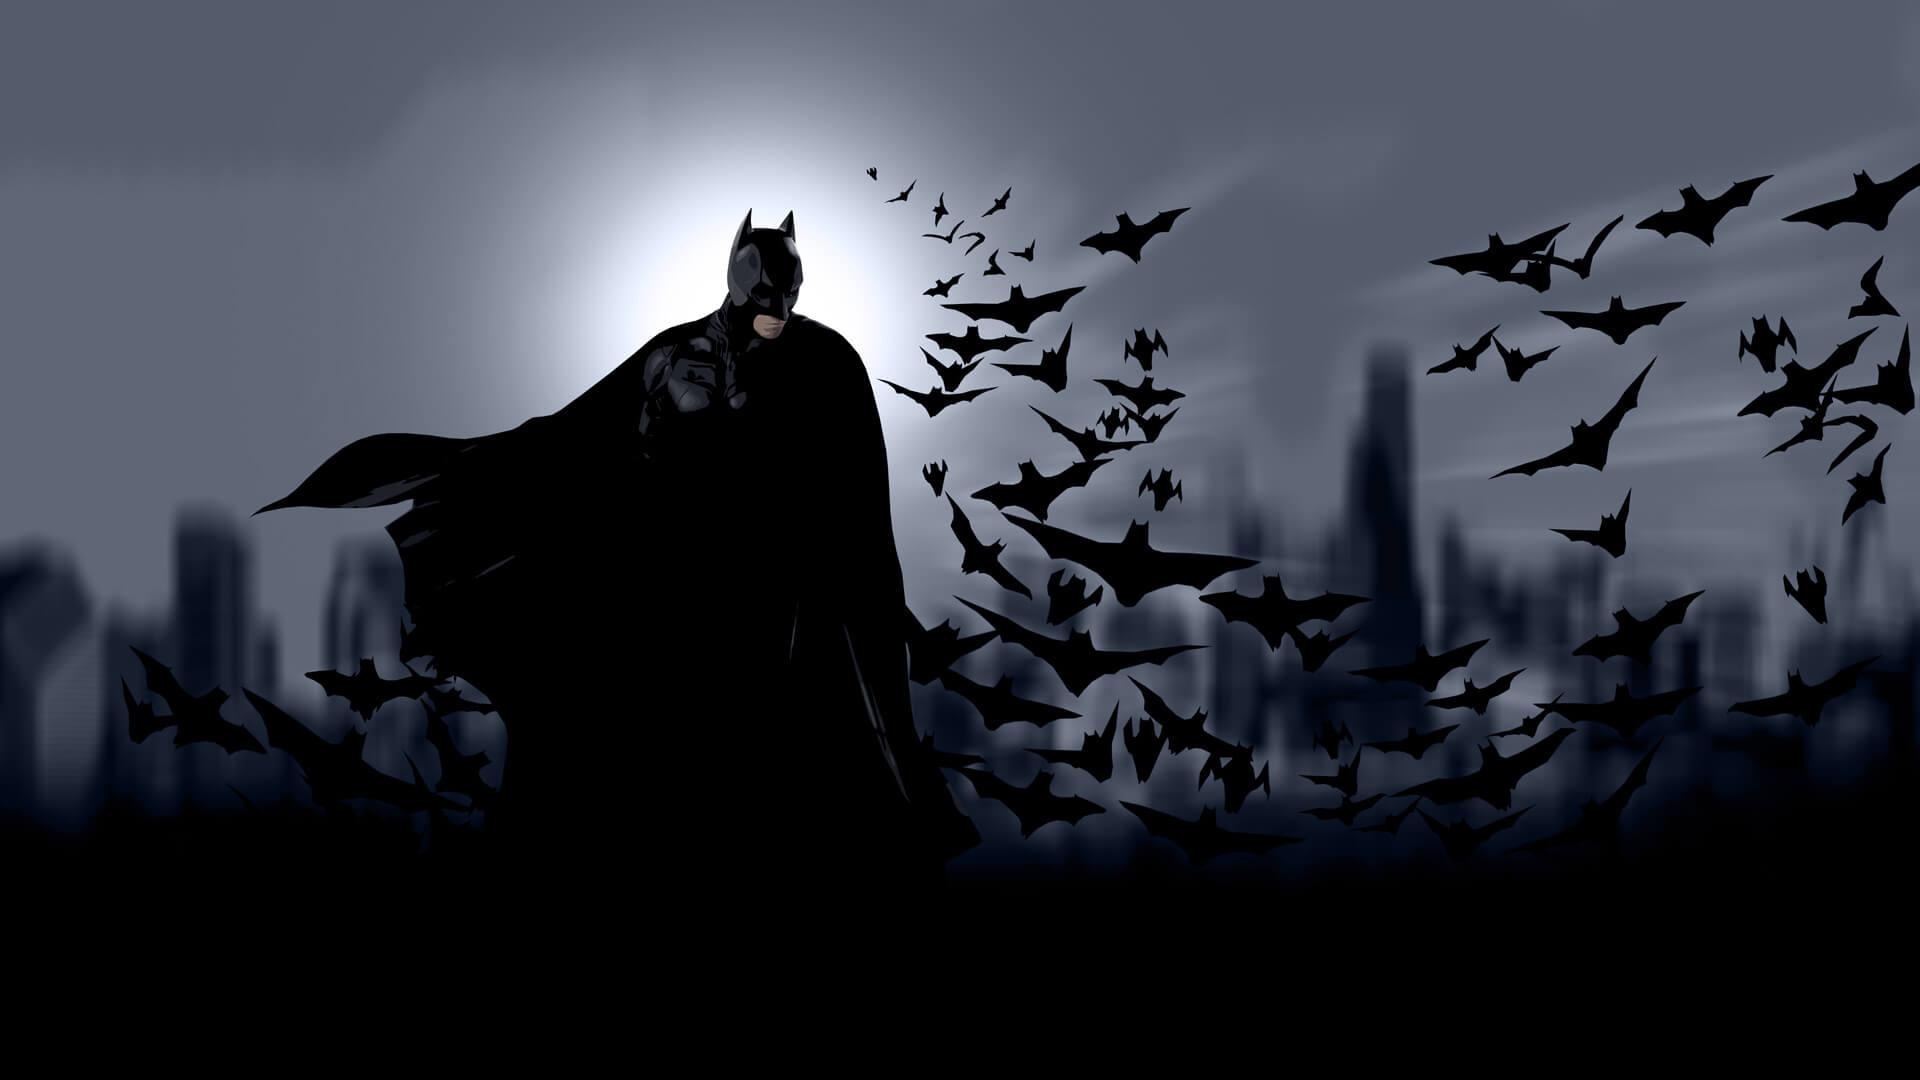 Batman Hd Images Free Download Best Hd Wallpaper